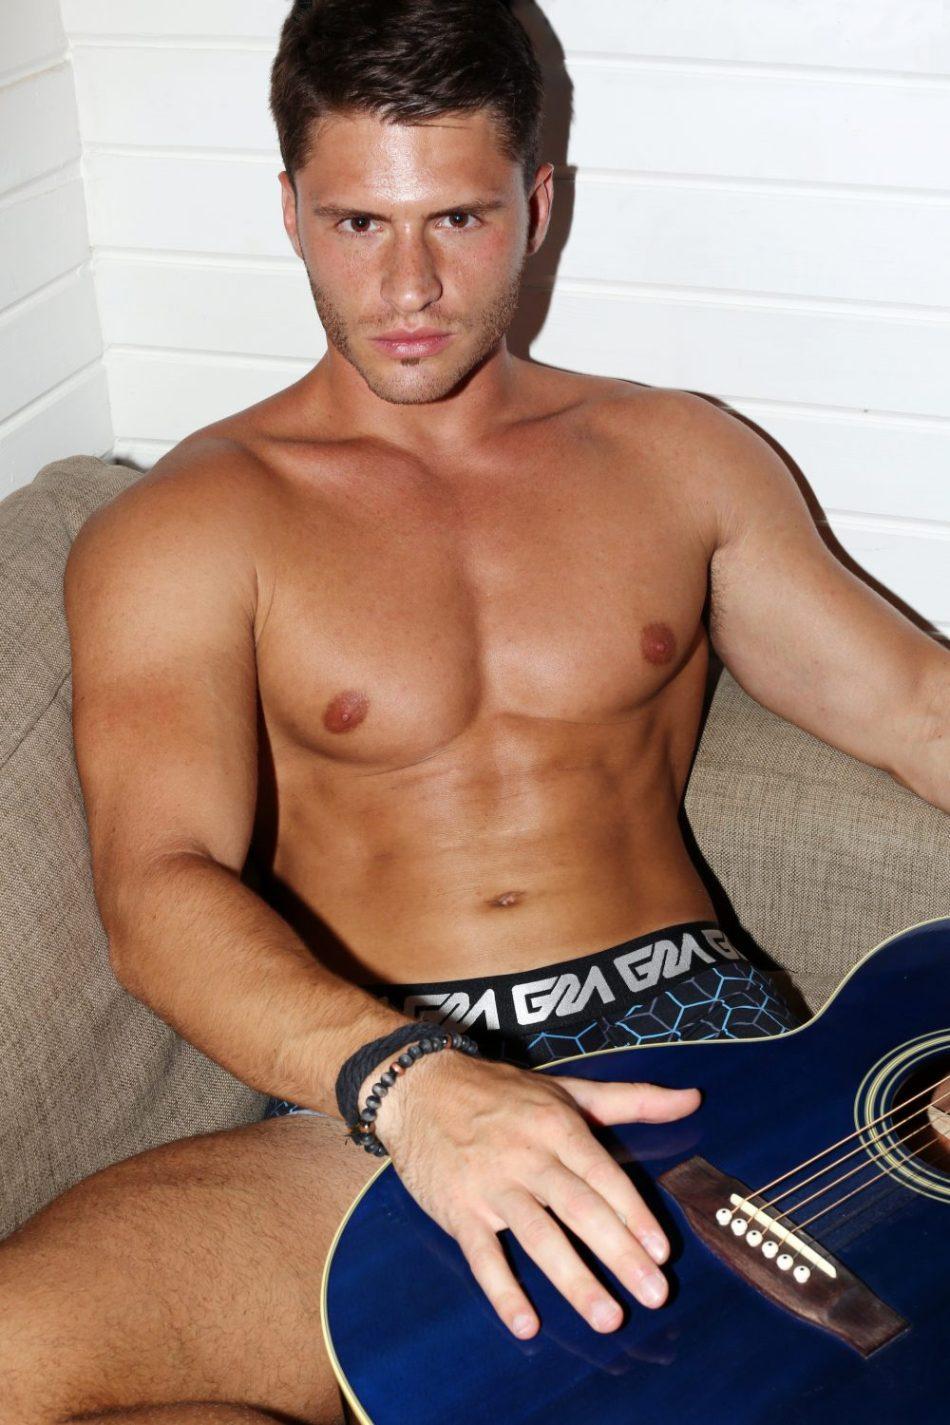 Find 'Mr. Right' Rony Gilman on New Pics from Garçon Model